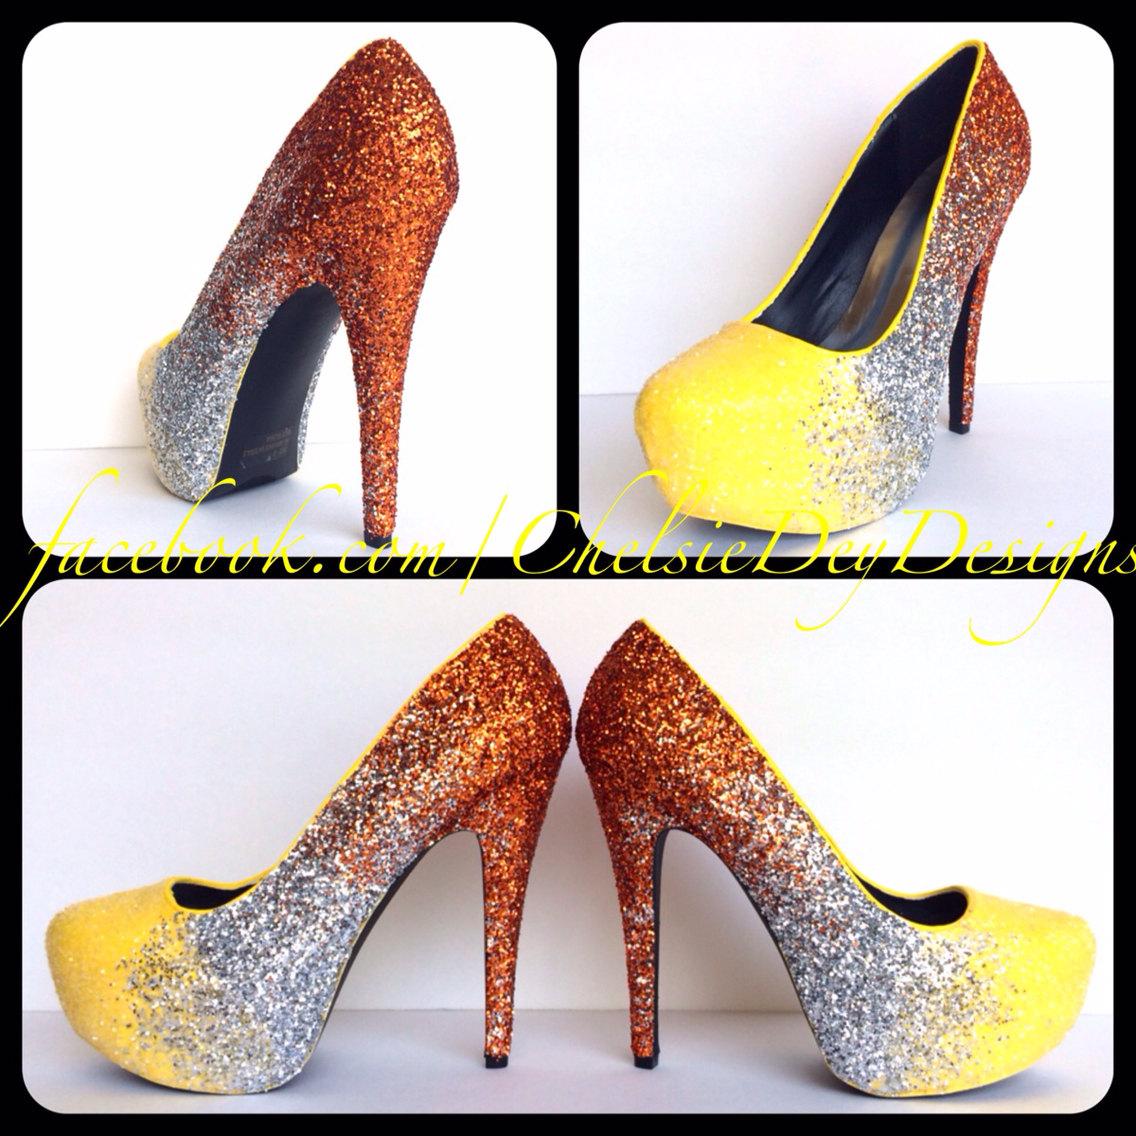 57c3c6ac5f633 Glitter High Heels - Orange Silver Yellow Pumps - Ombre Platform Prom Shoes  from Chelsie Dey Designs